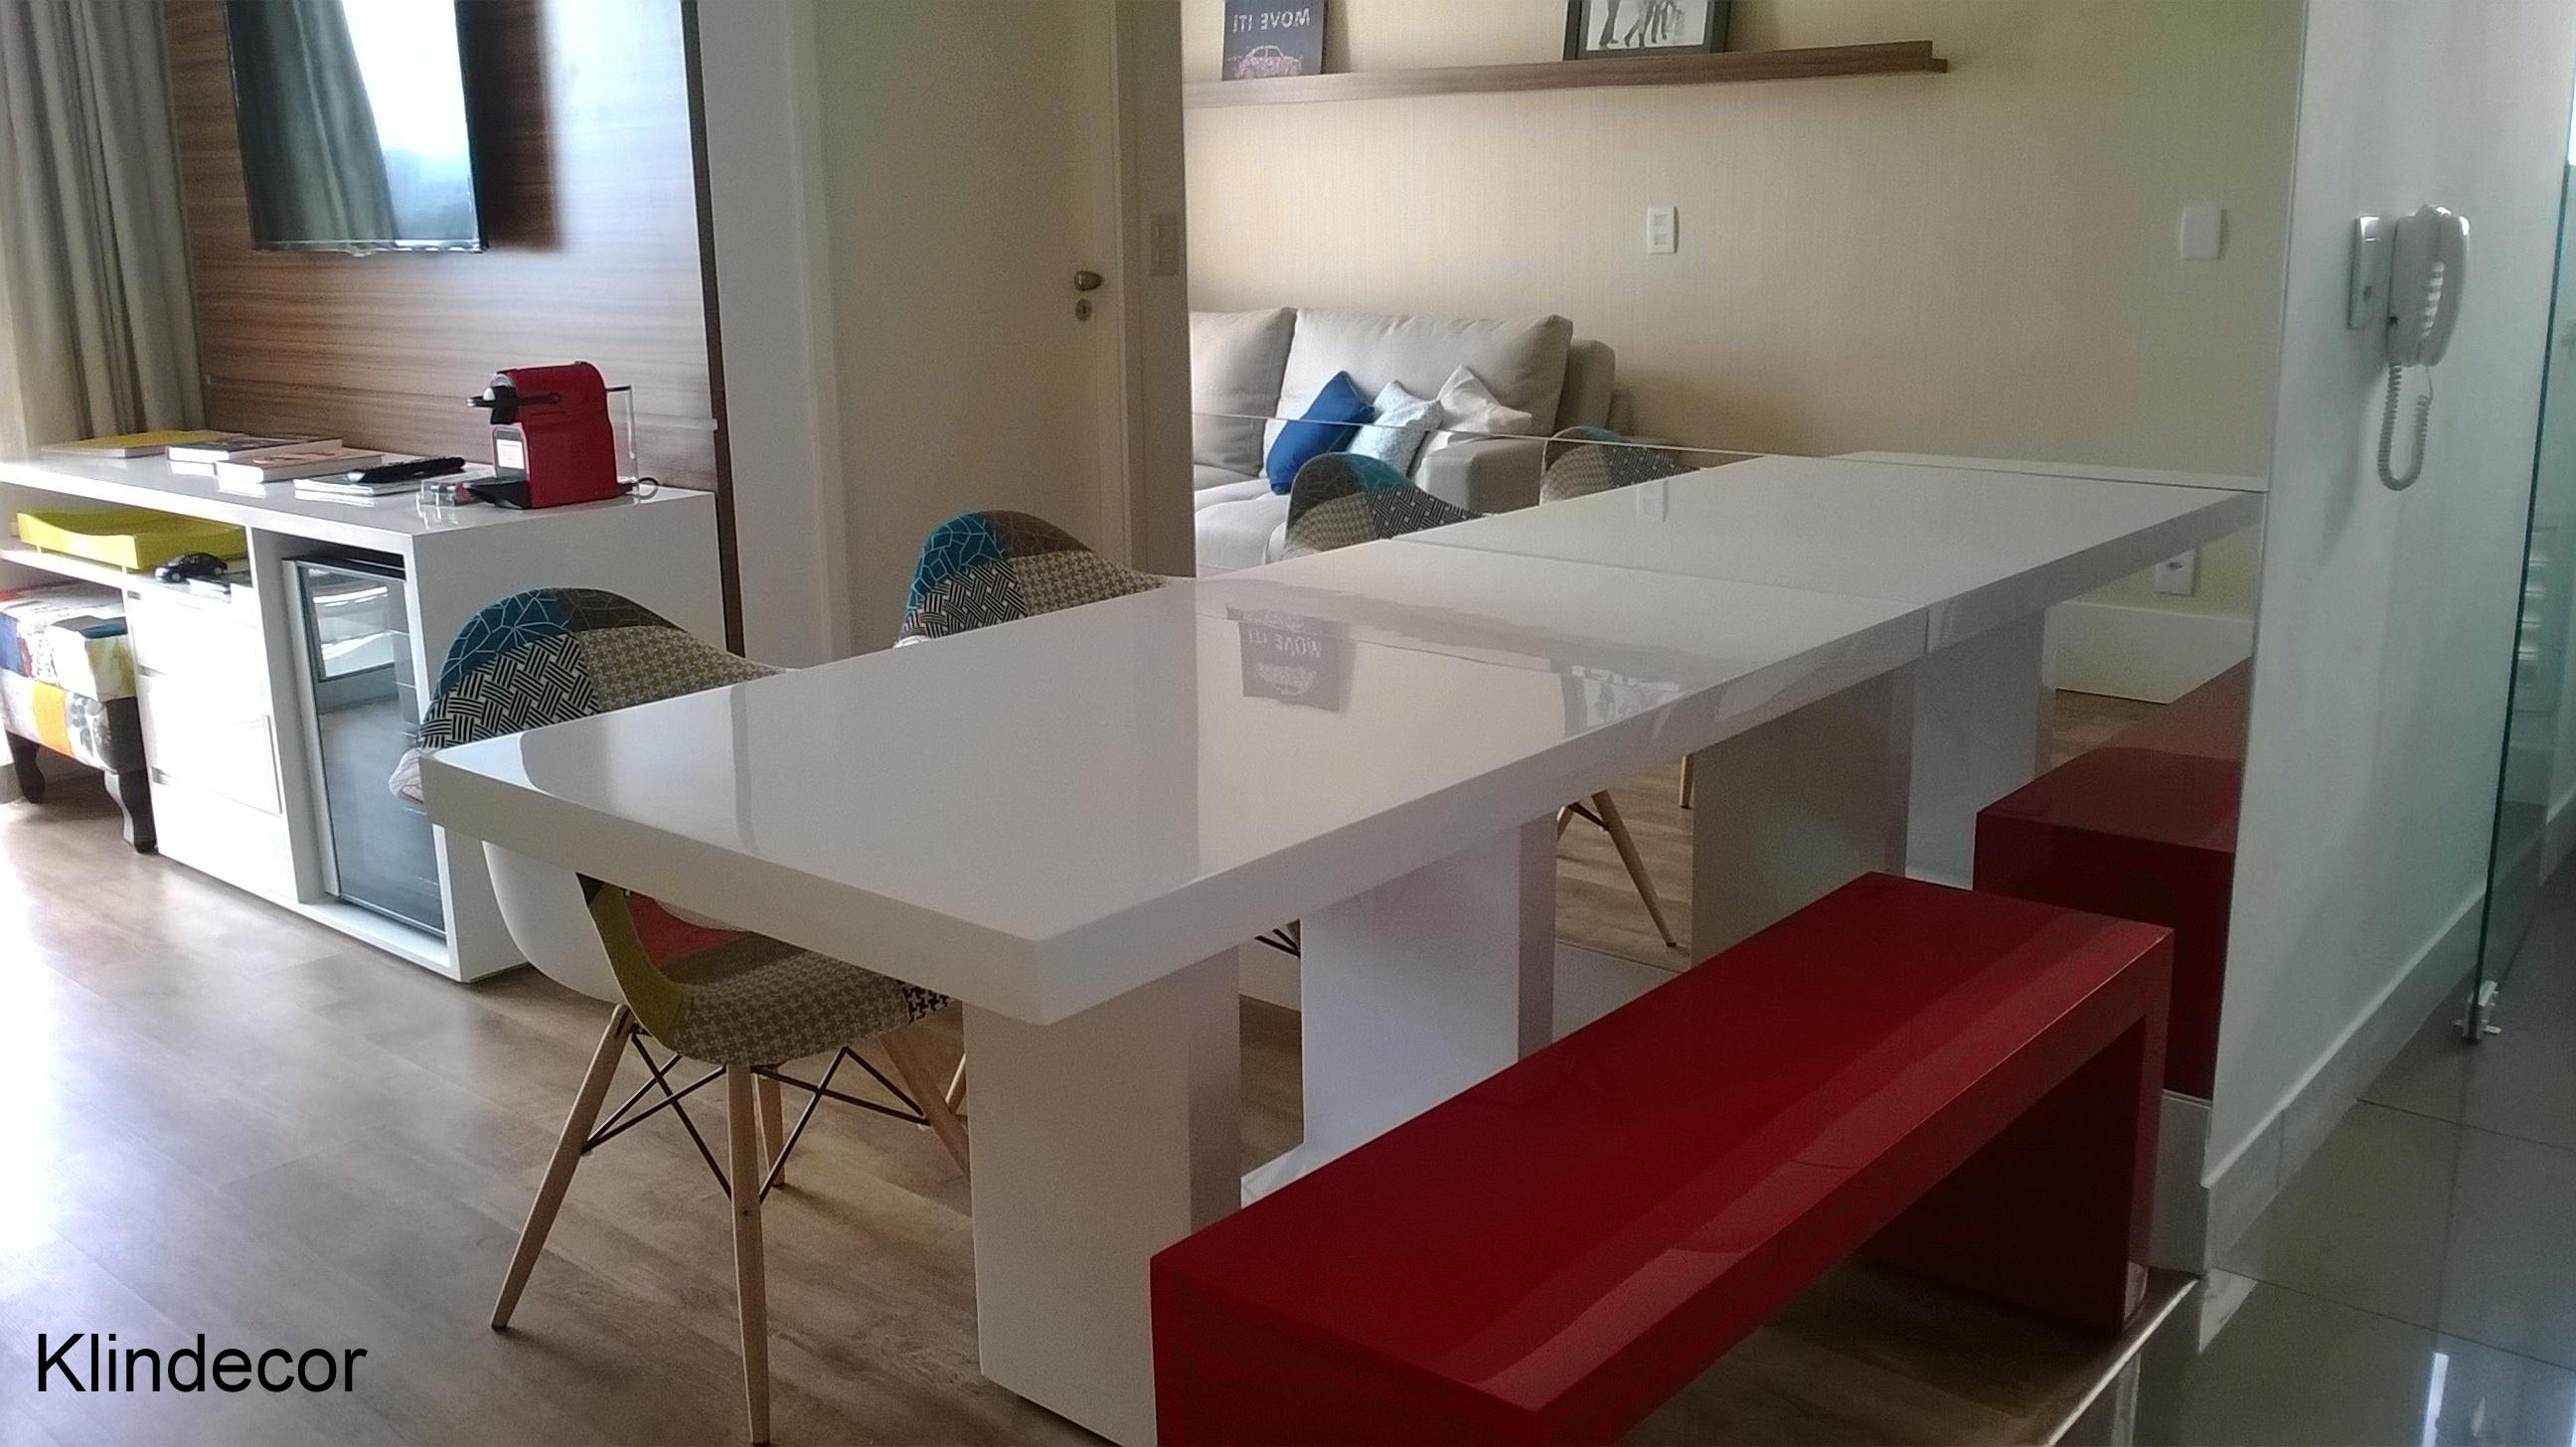 Sala De Jantar Resina Branca ~ de jantar de resina branca lugare mesa resinada mesa jantar de resina